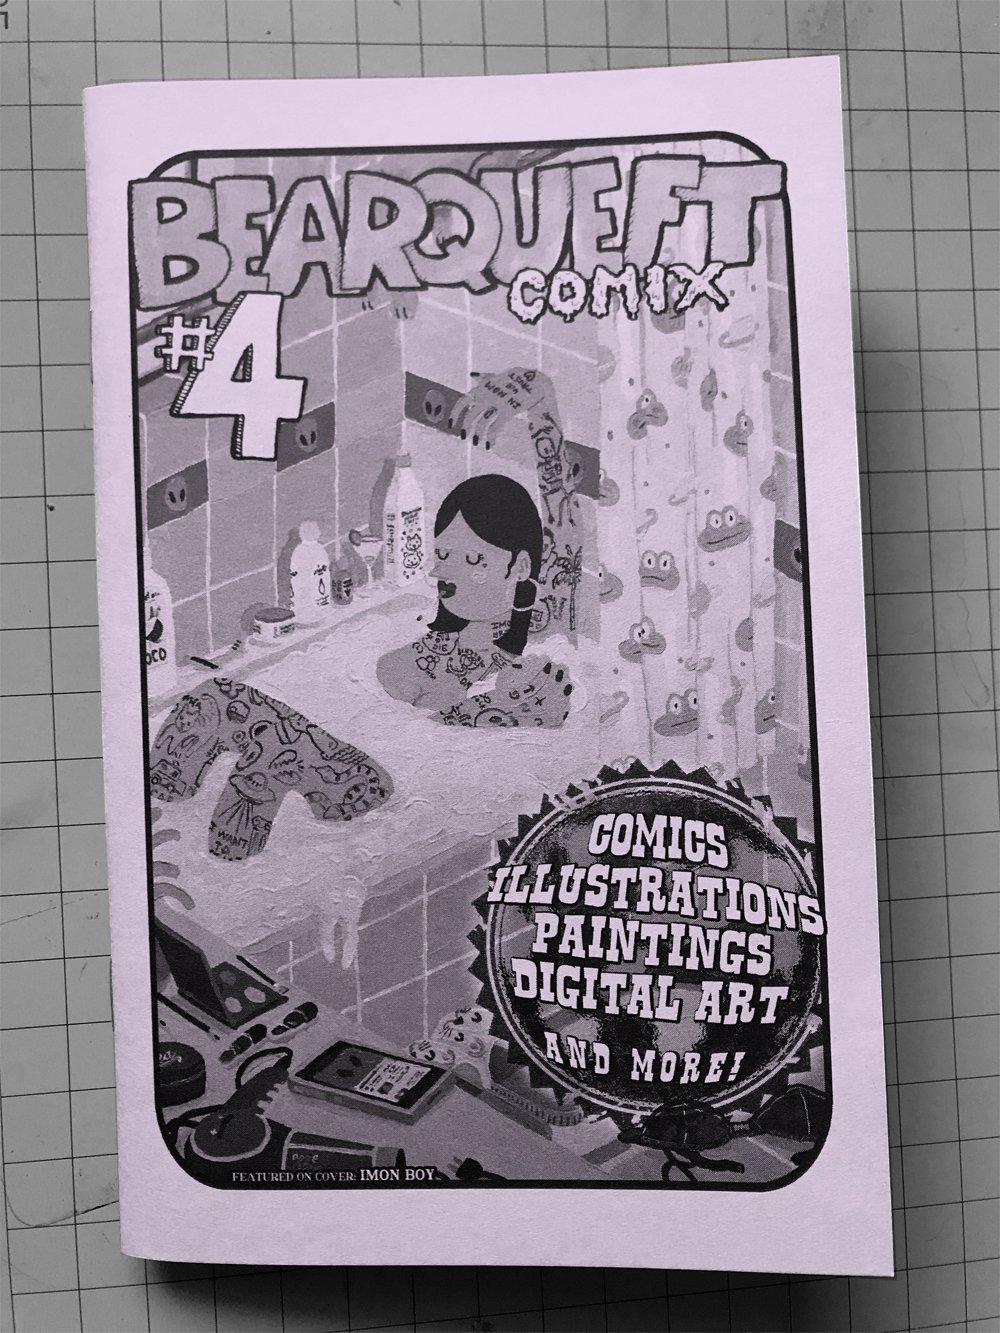 Bearqueft Comix - Issue #4